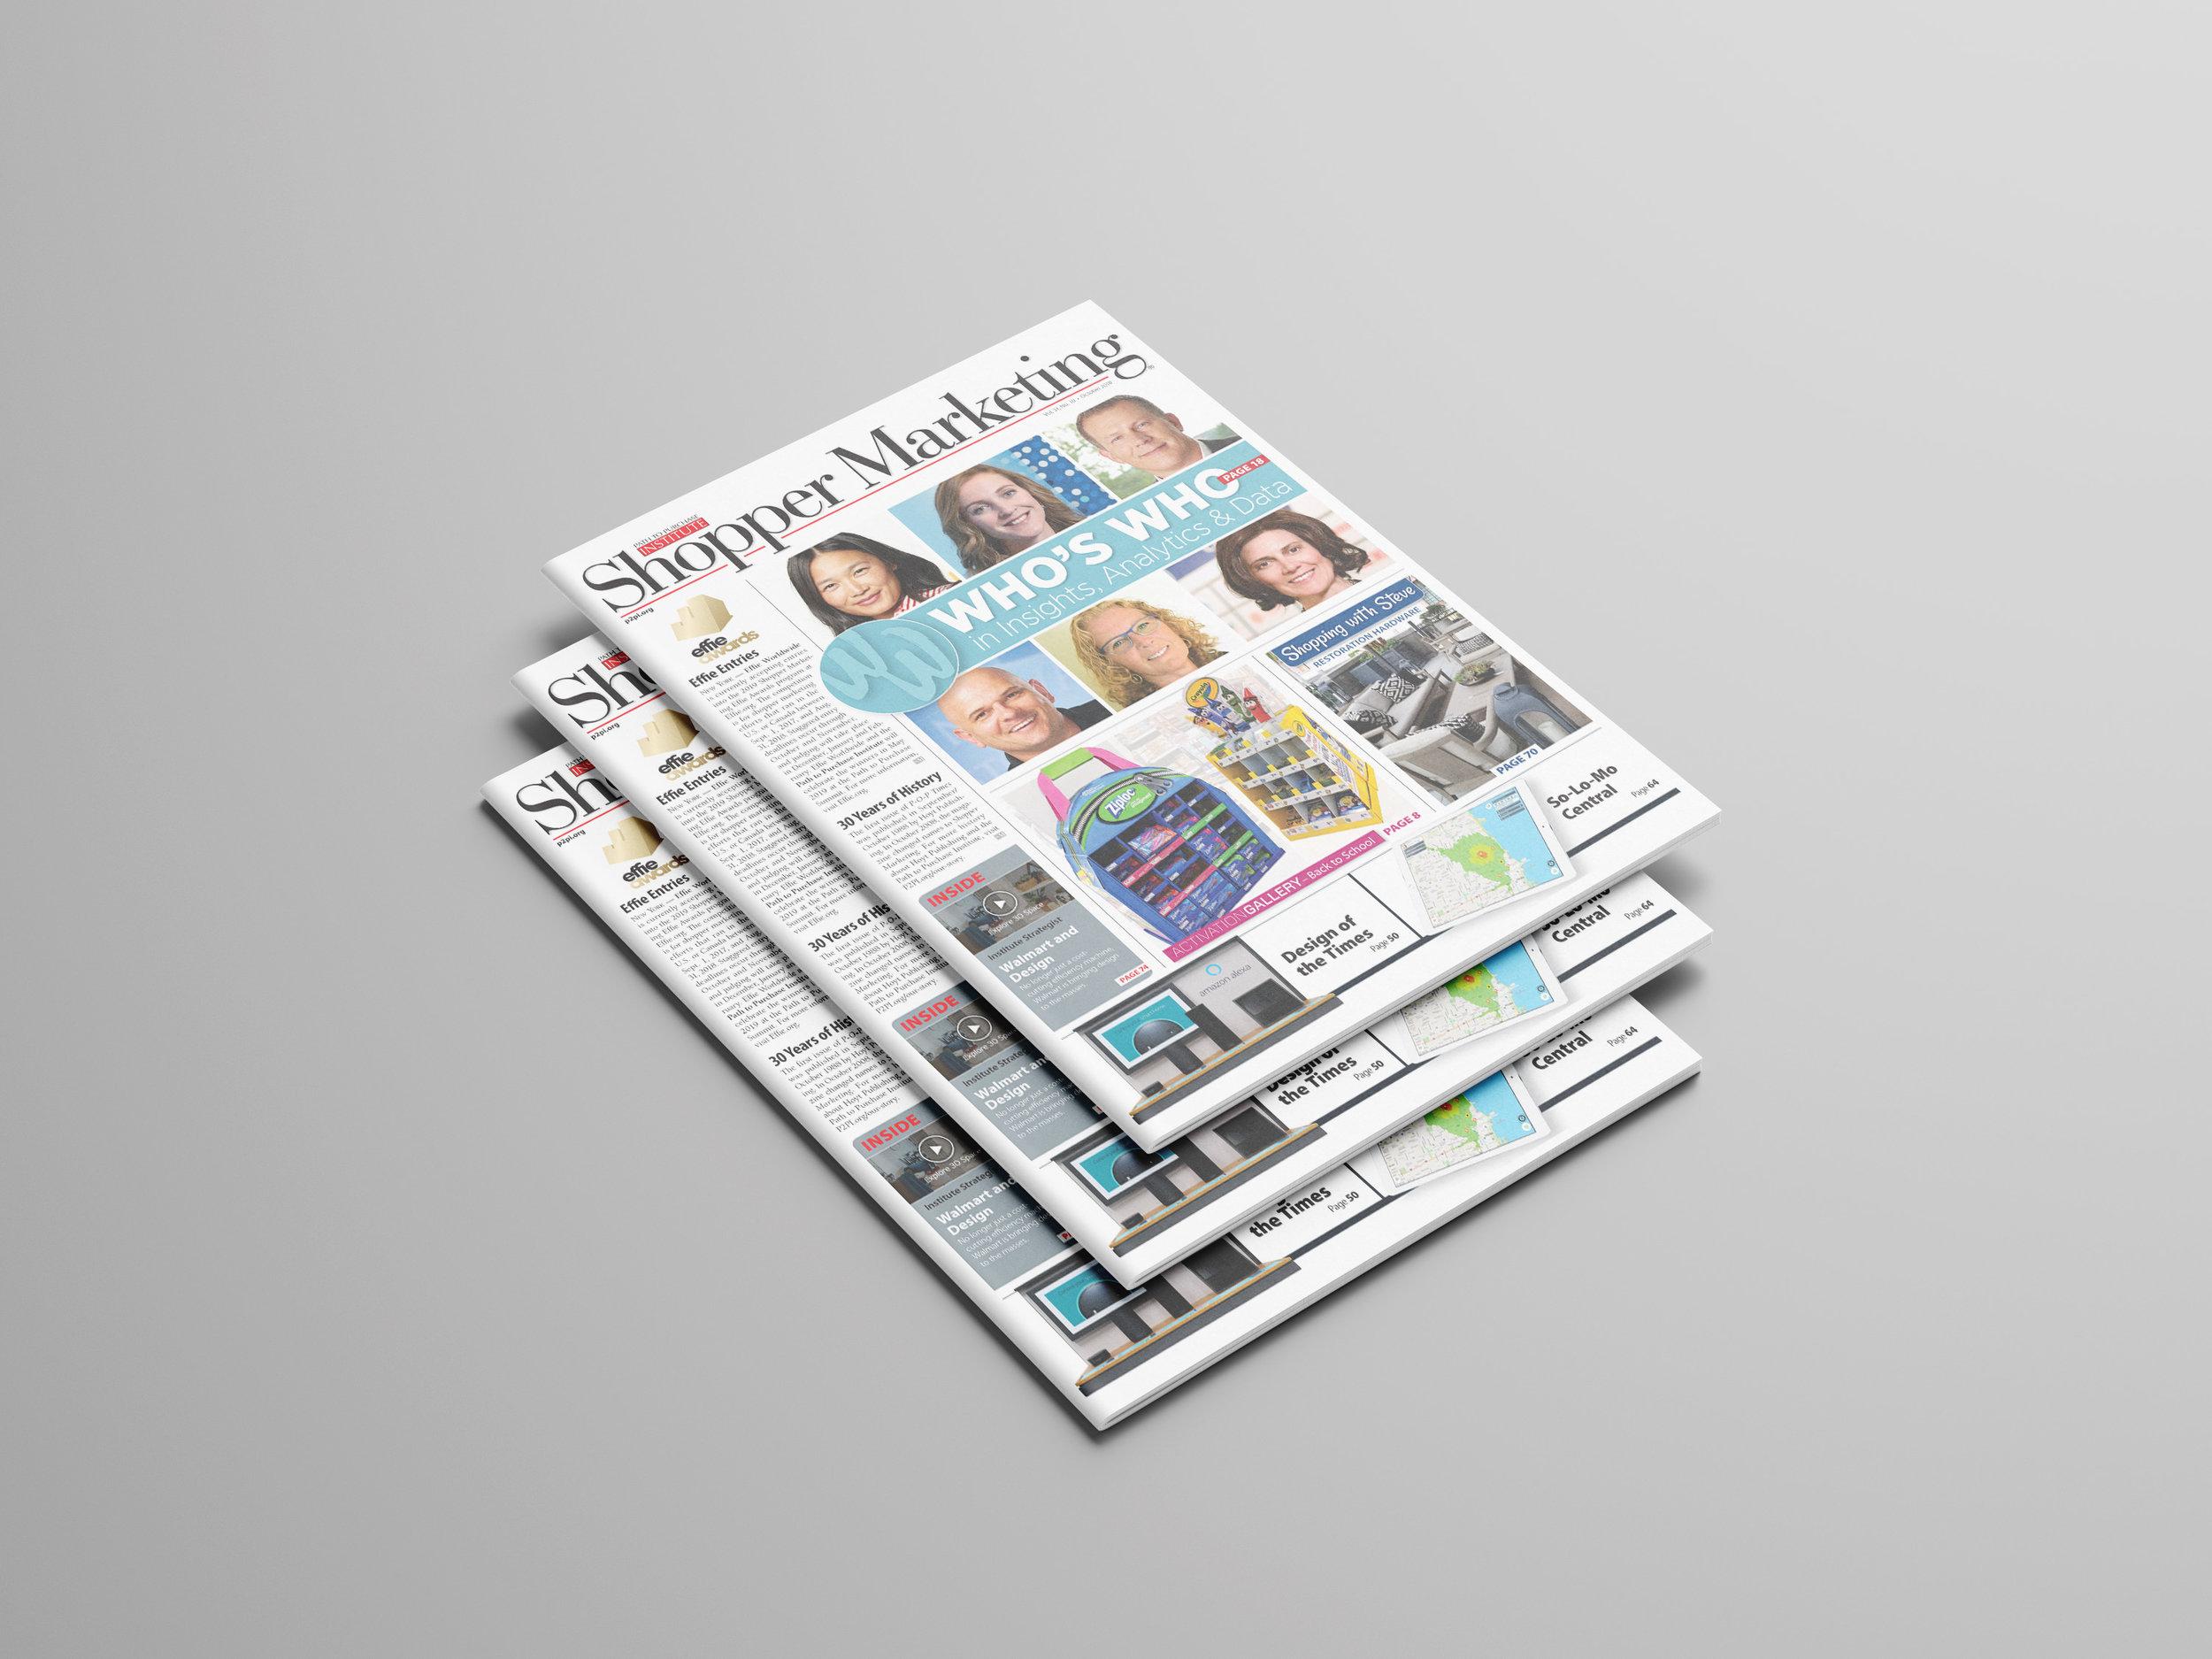 Free_A4_Brochure_Mockup_04_LayerCake-Cover.jpg